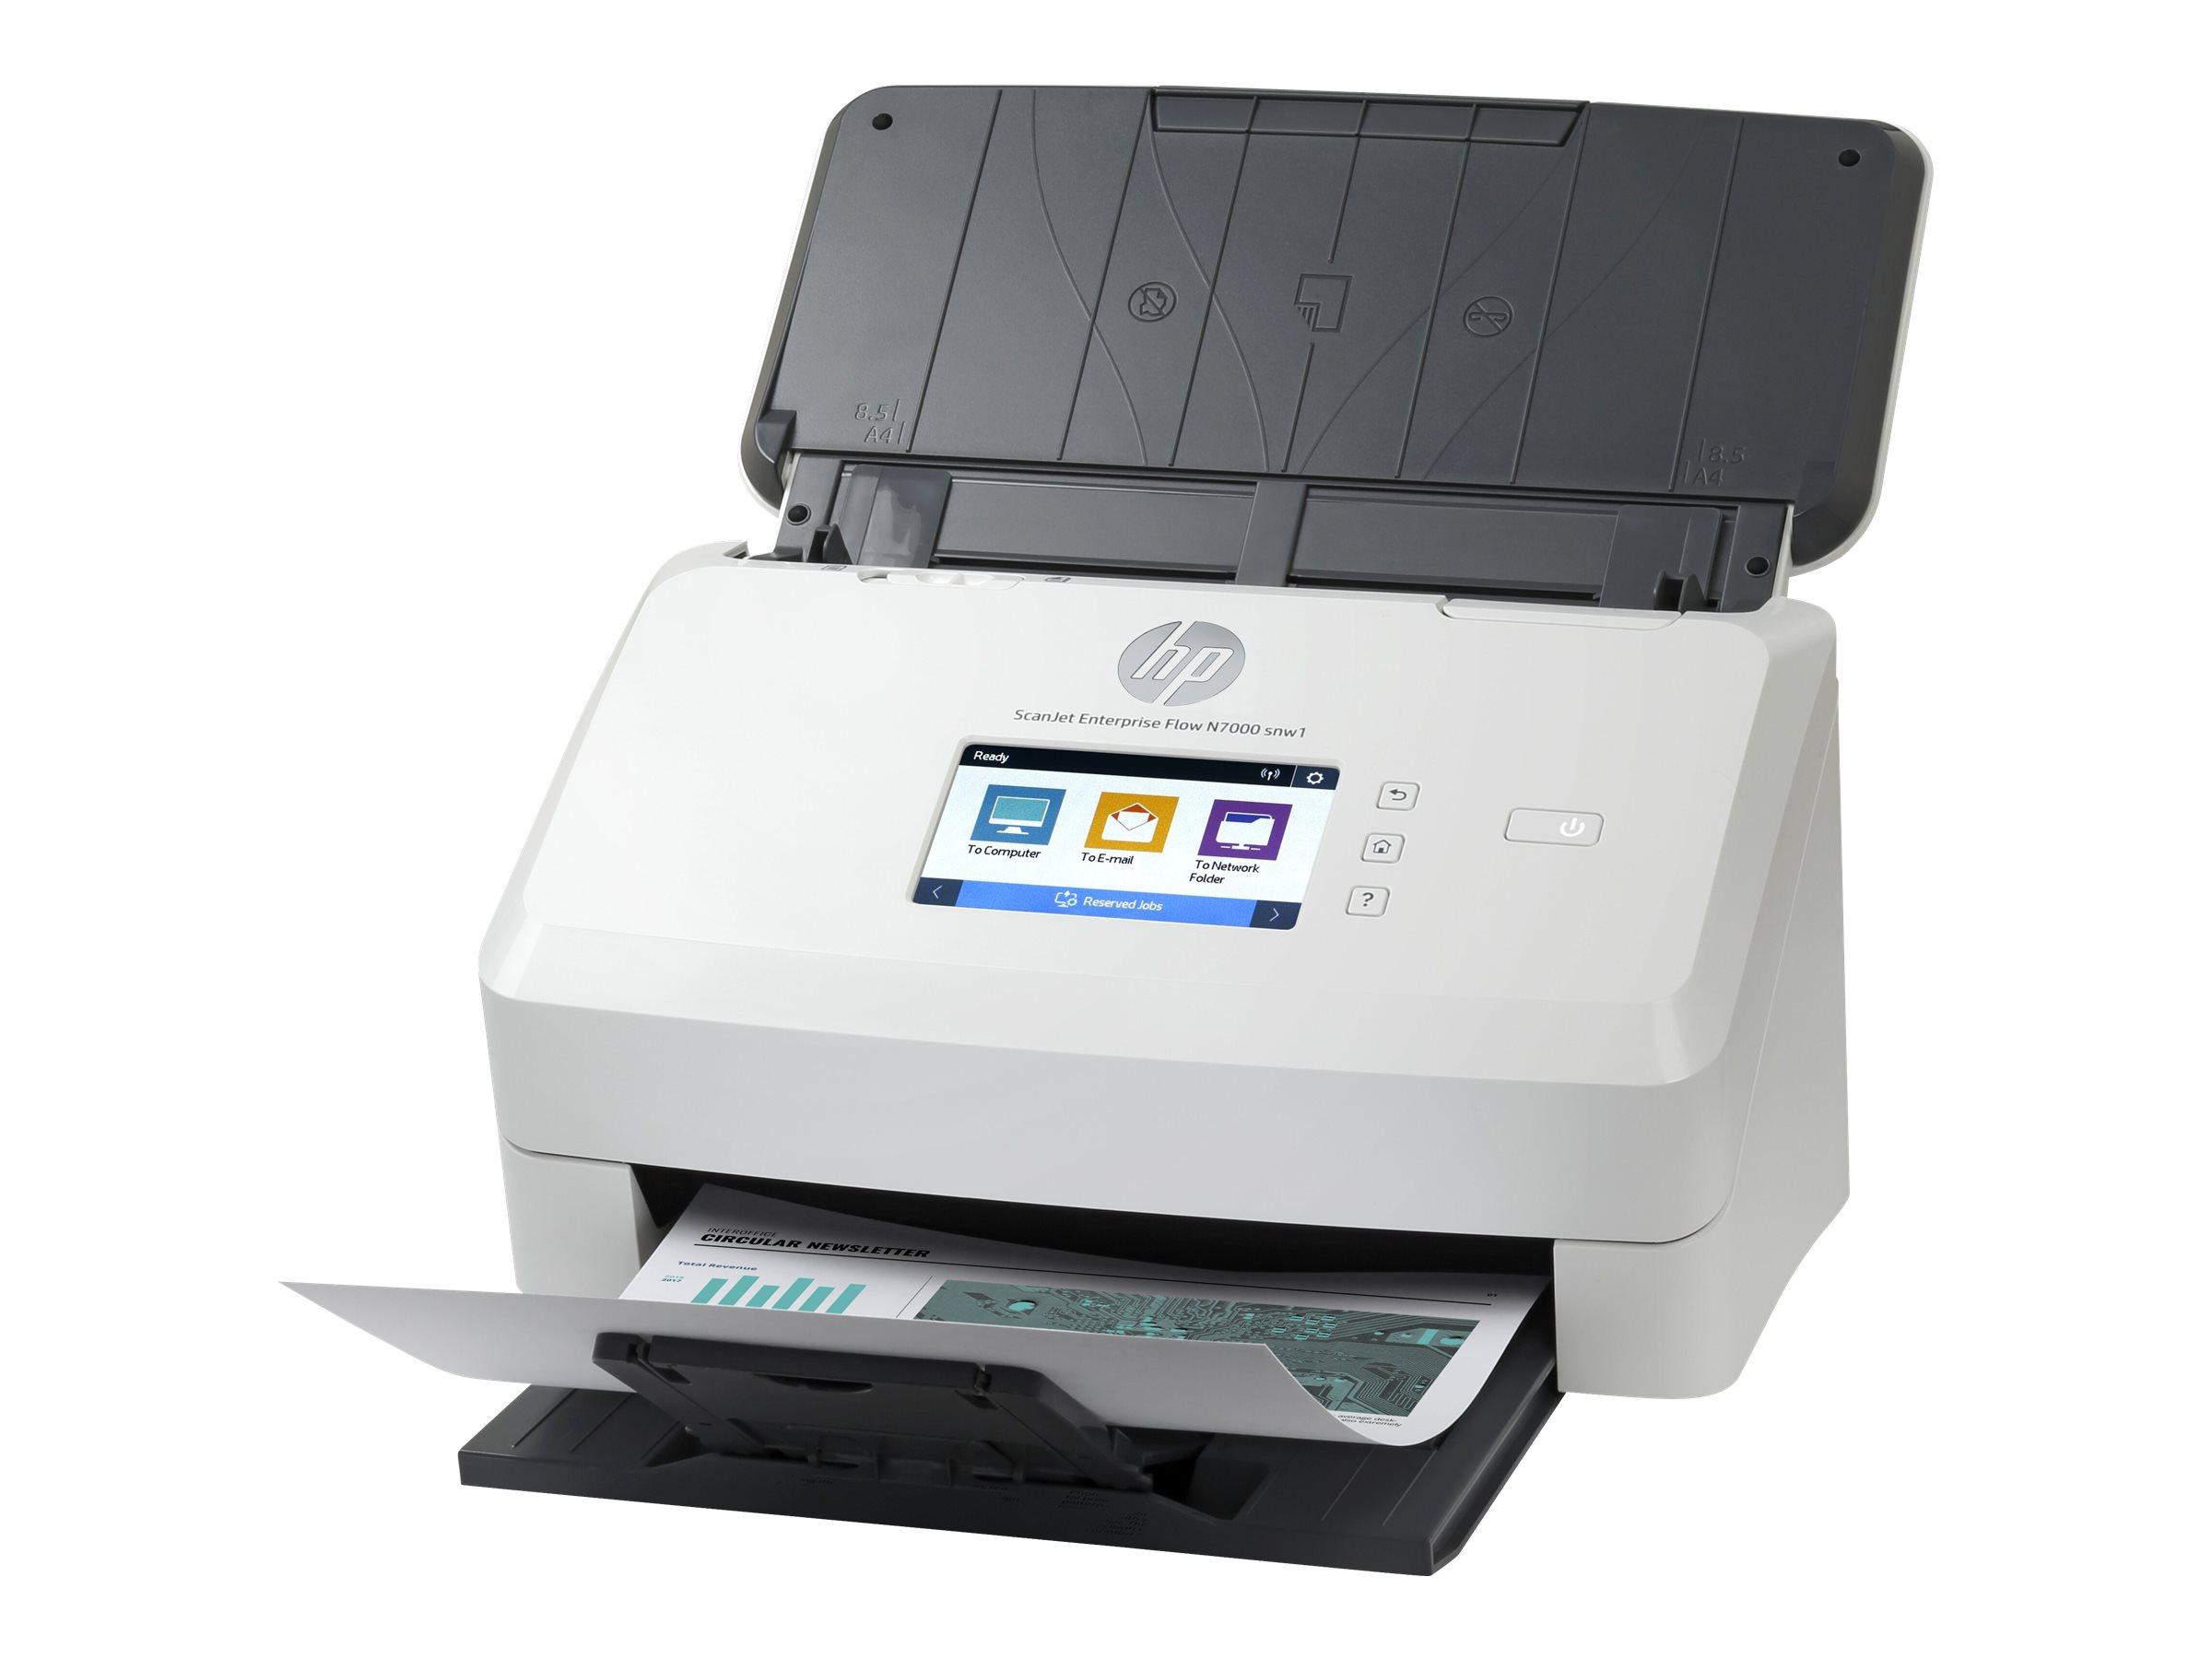 HP ScanJet Enterprise Flow N7000 snw1 - Dokumentenscanner - CMOS / CIS - Duplex - 216 x 3100 mm - 600 dpi x 600 dpi